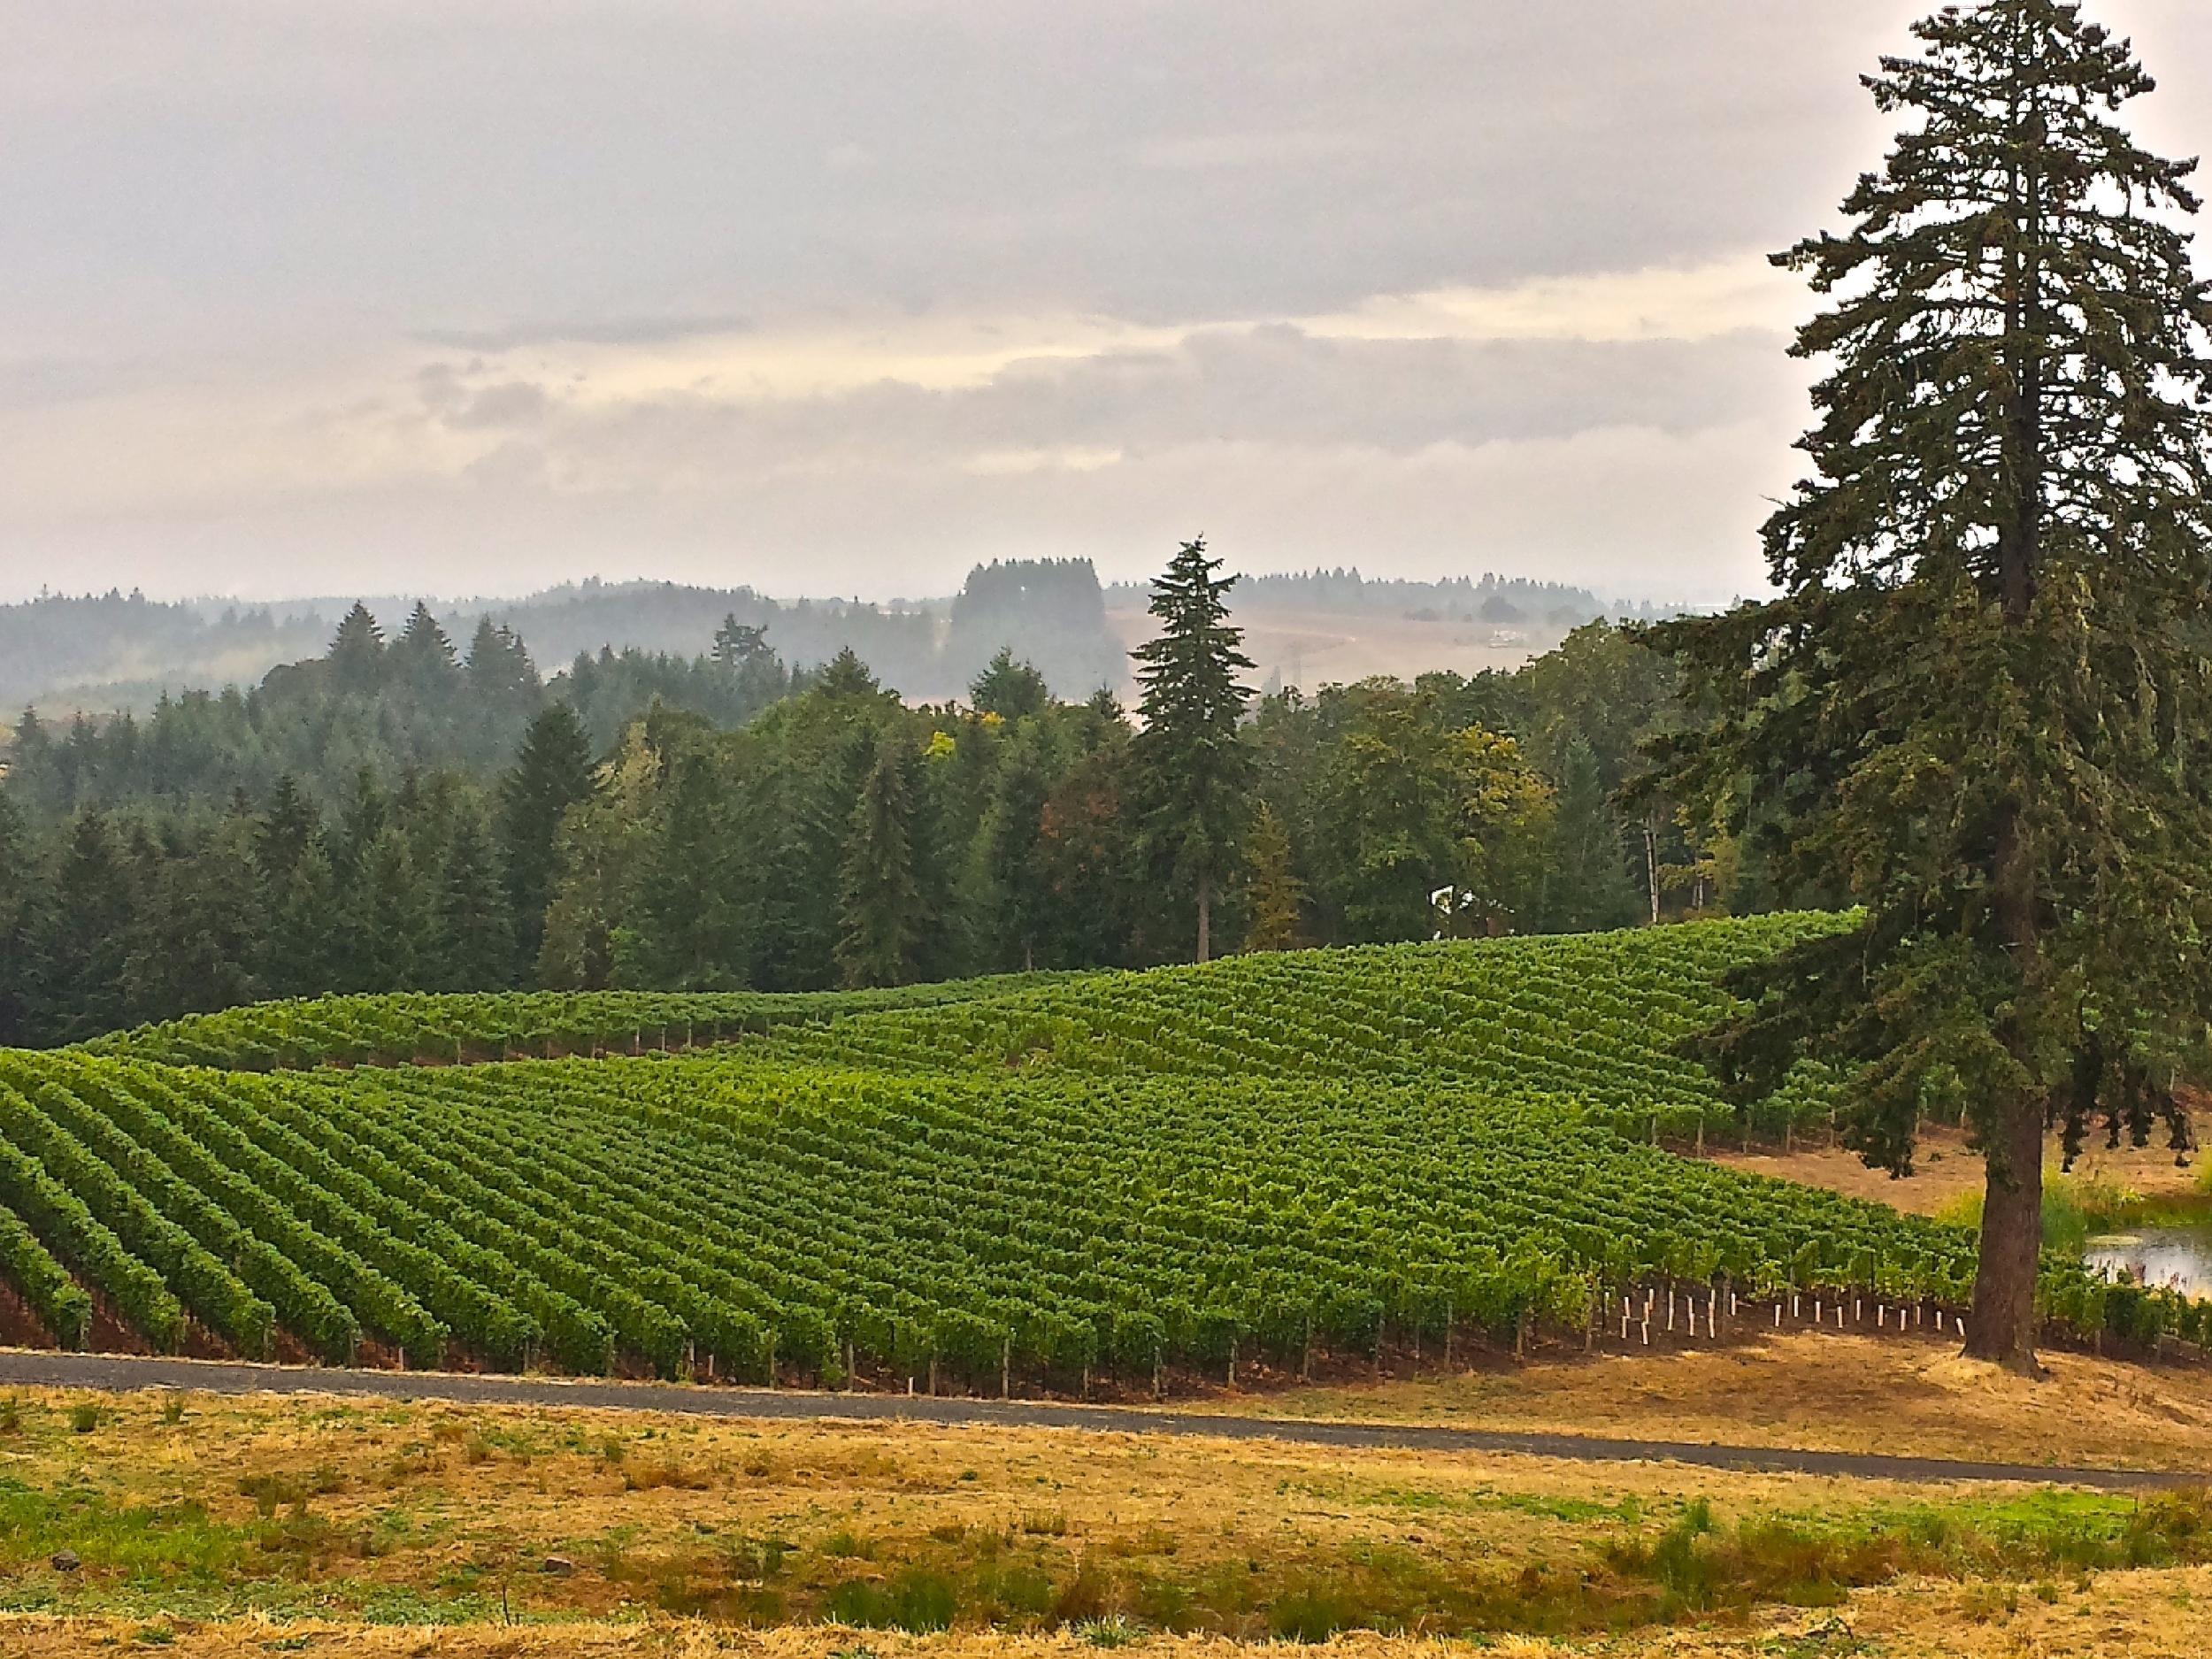 Willamette Valley Wineries